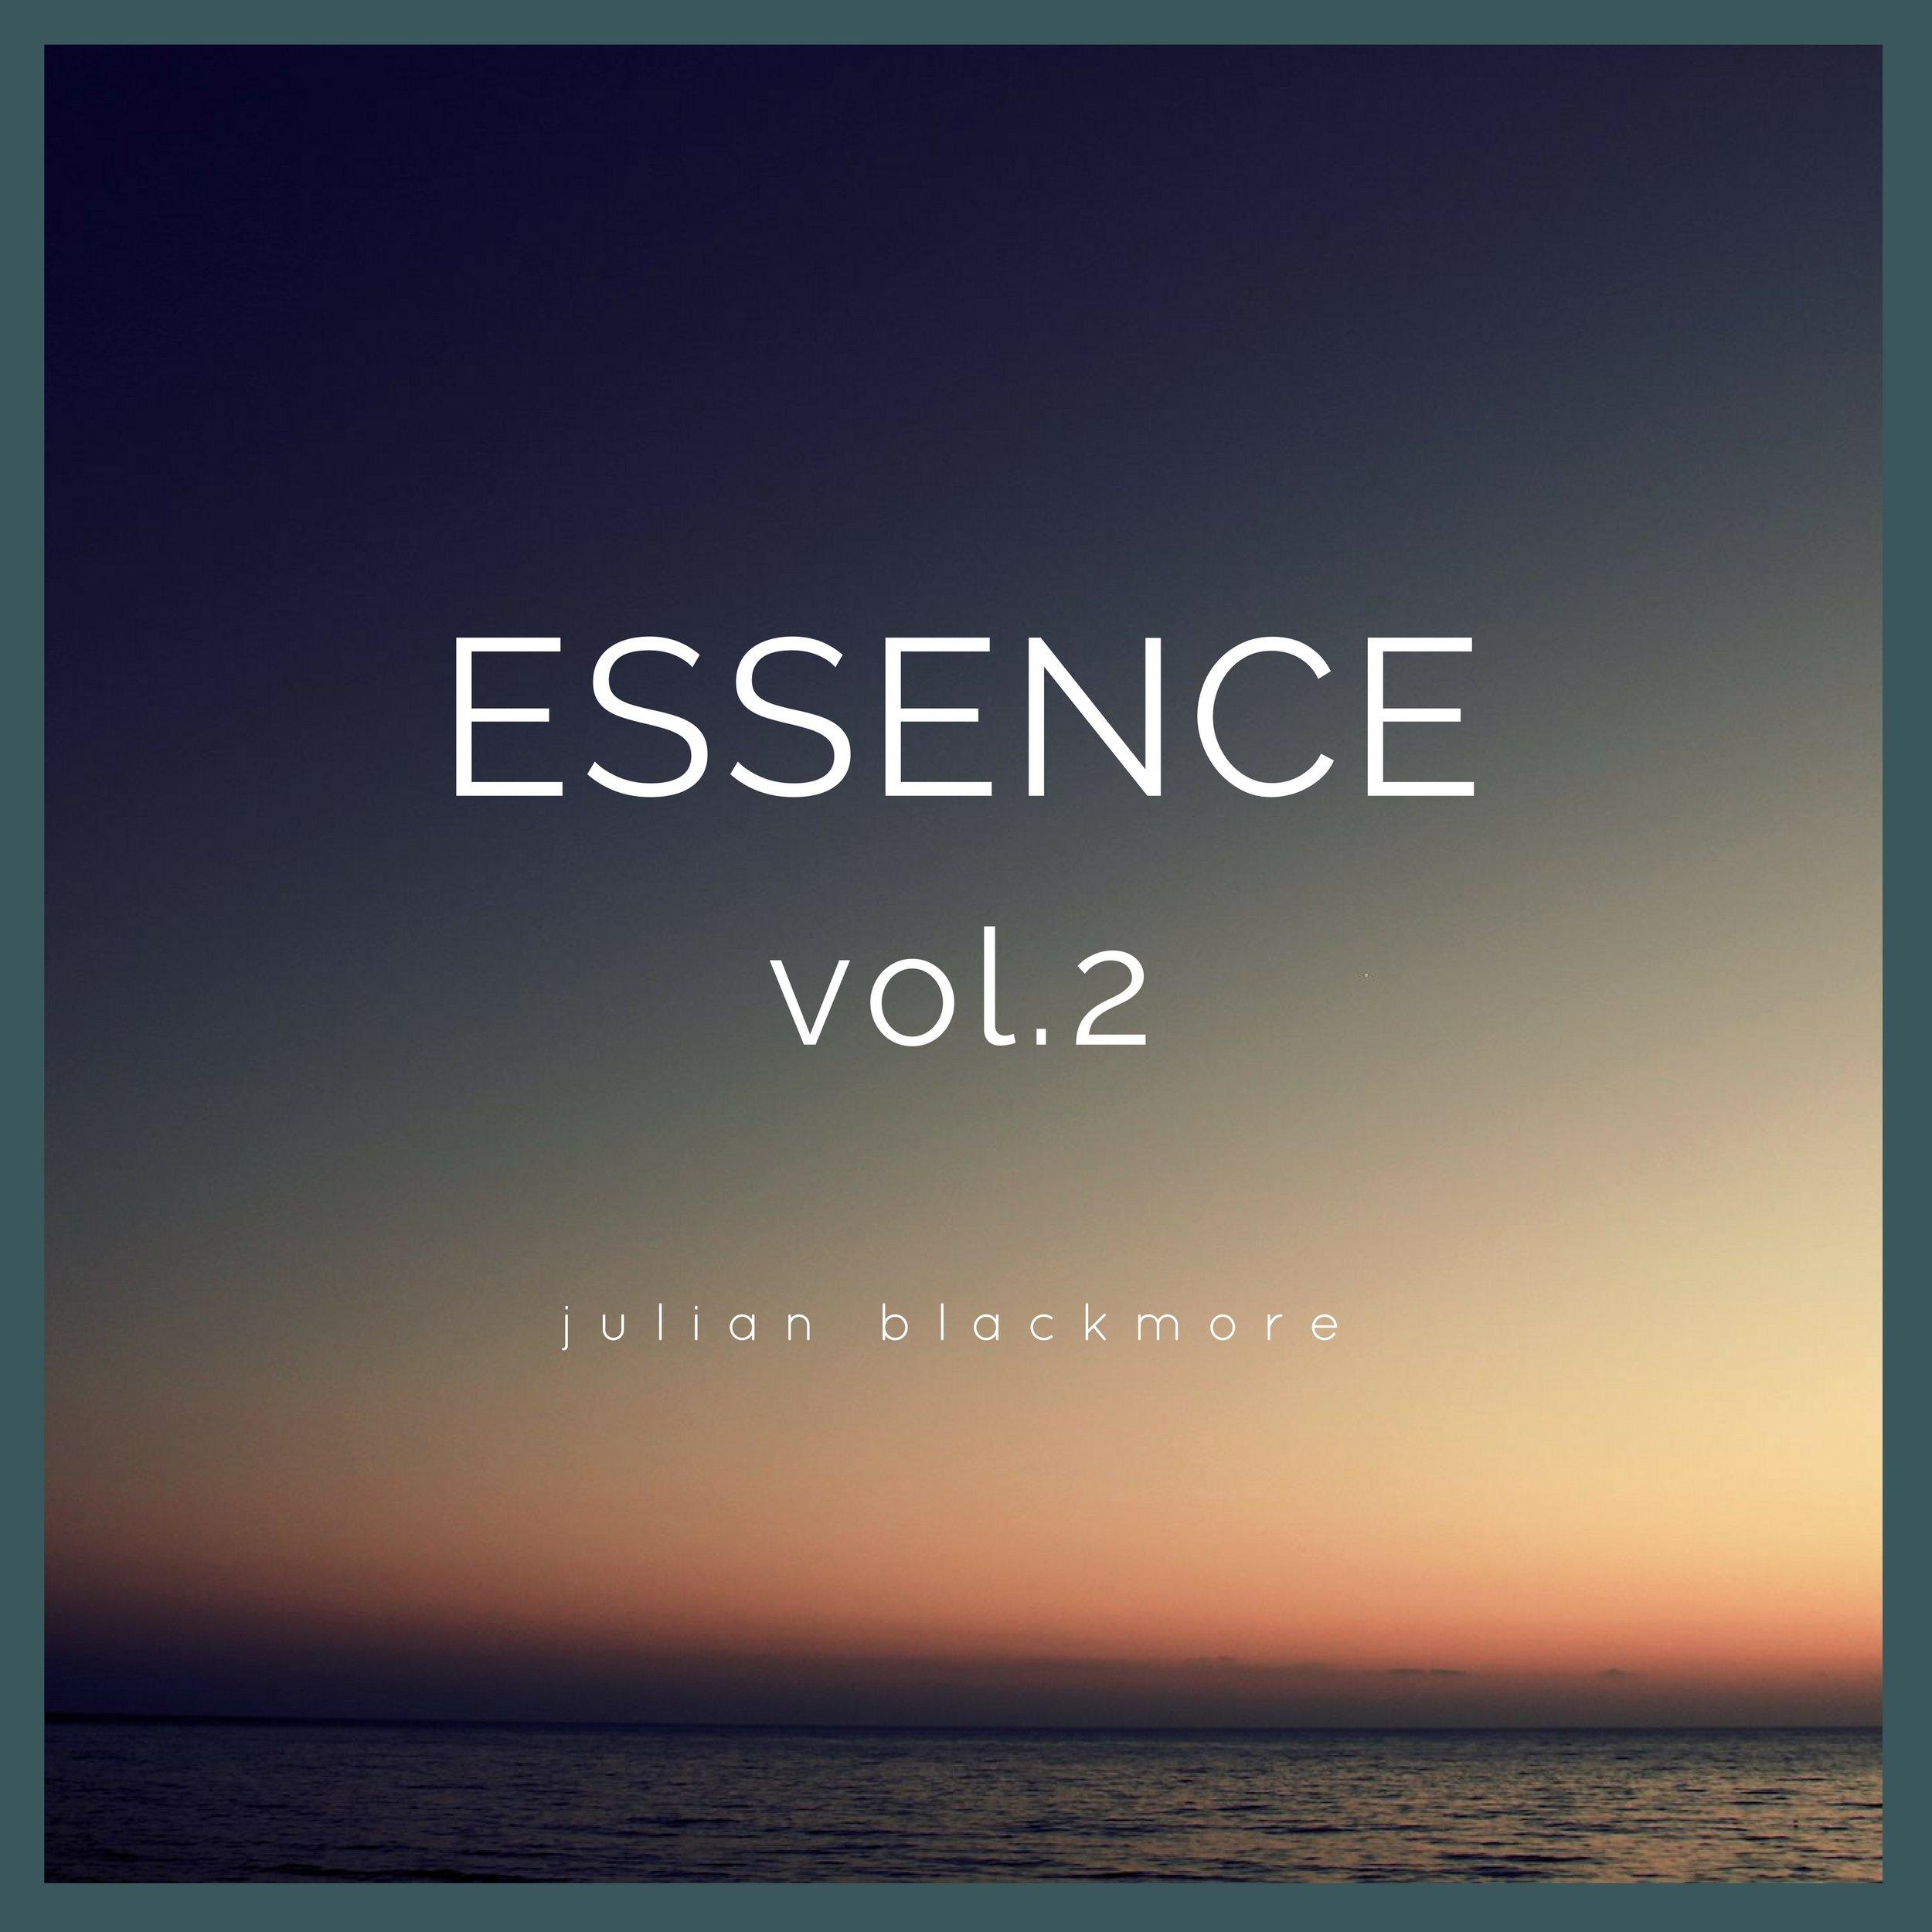 Essence Vol 2 Cover 3000x3000.jpg